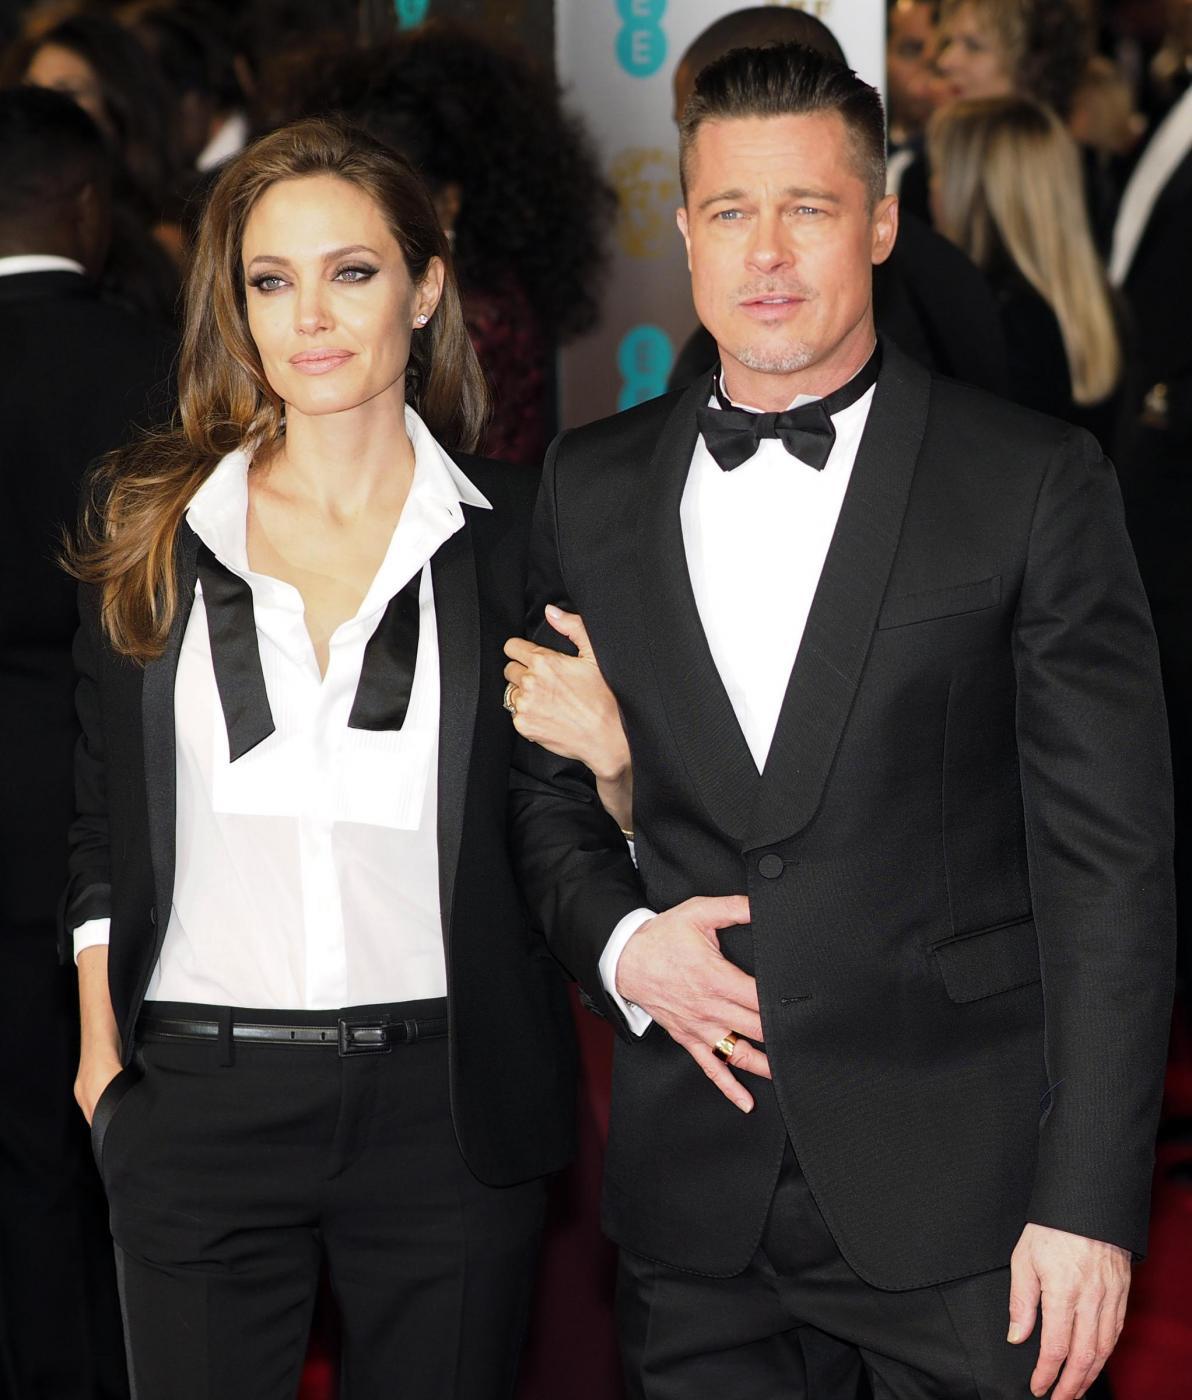 Bafta 2014, Brad Pitt e Angelina Jolie in doppio smoking01